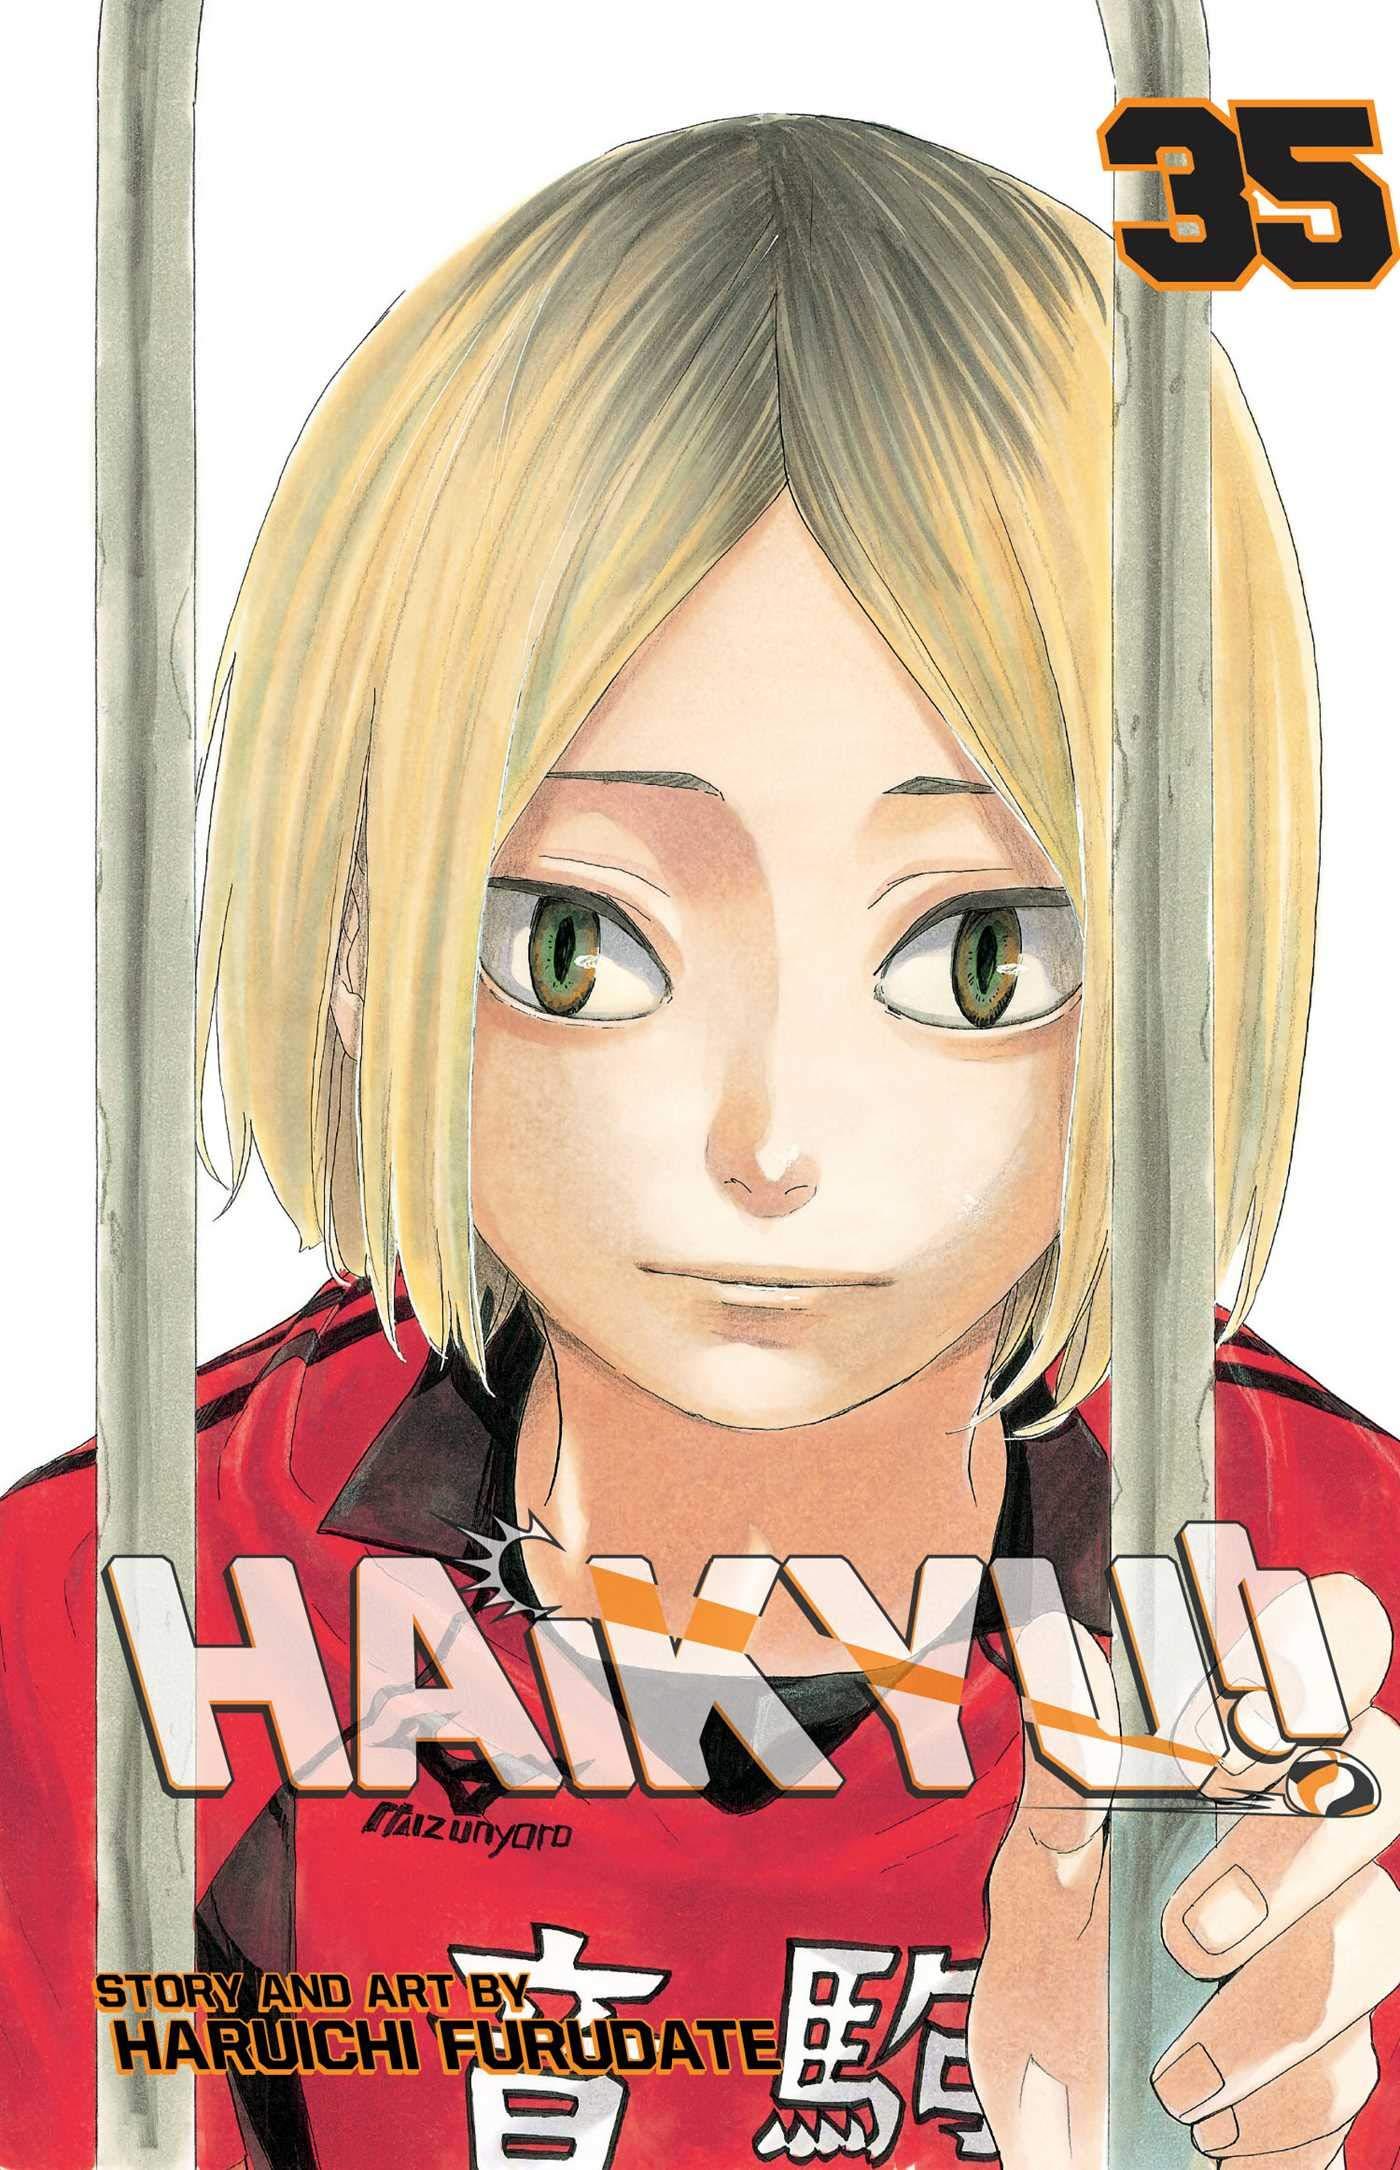 Haikyu!! - Tomo 35 - Haruichi Furudate - Manga ( Ingles)